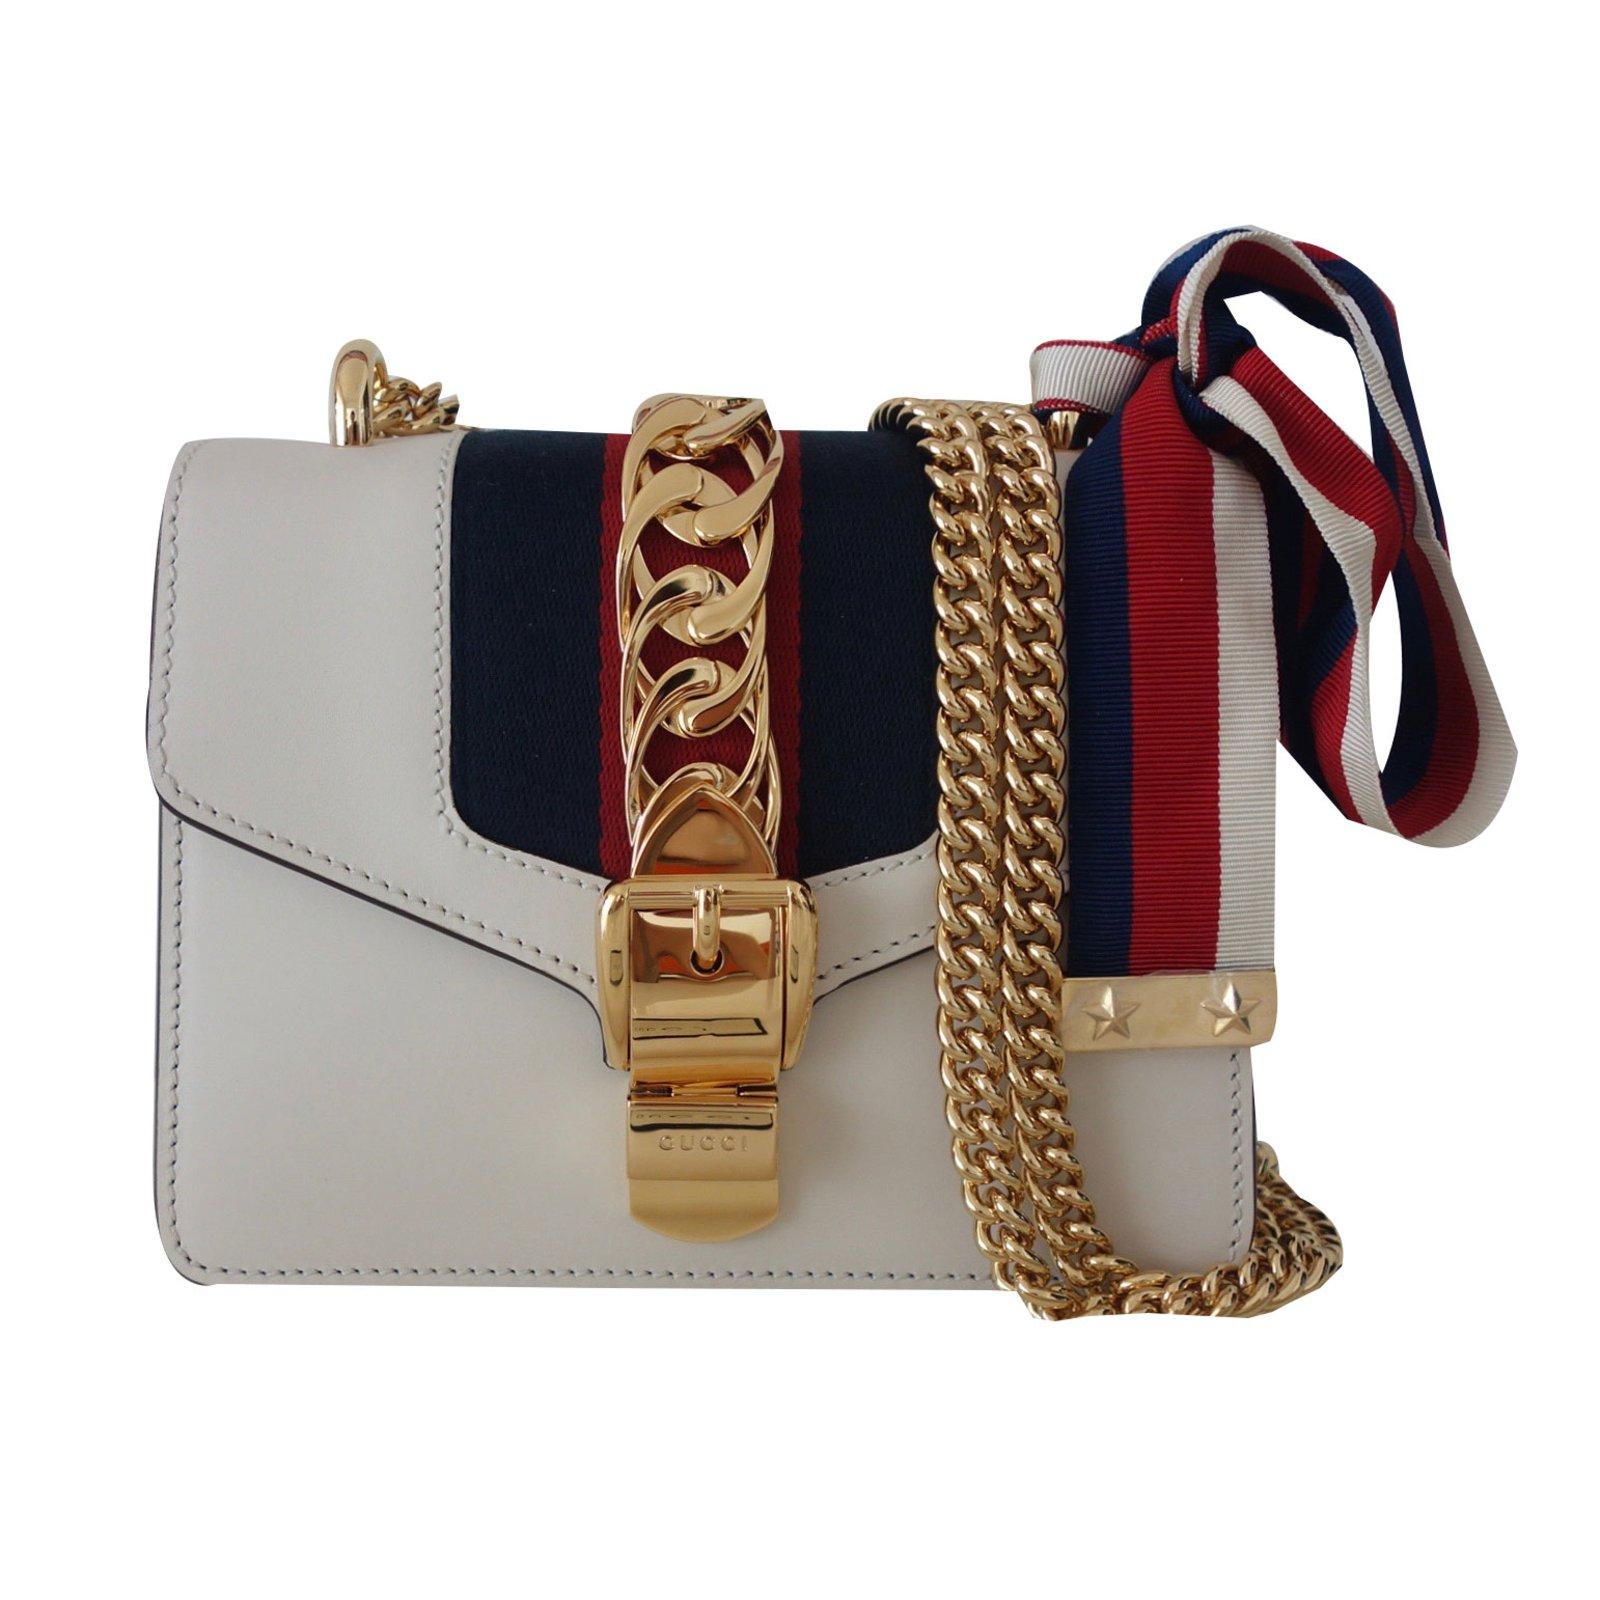 Gucci Sylvie Handbag Handbags Leather White Ref 37839